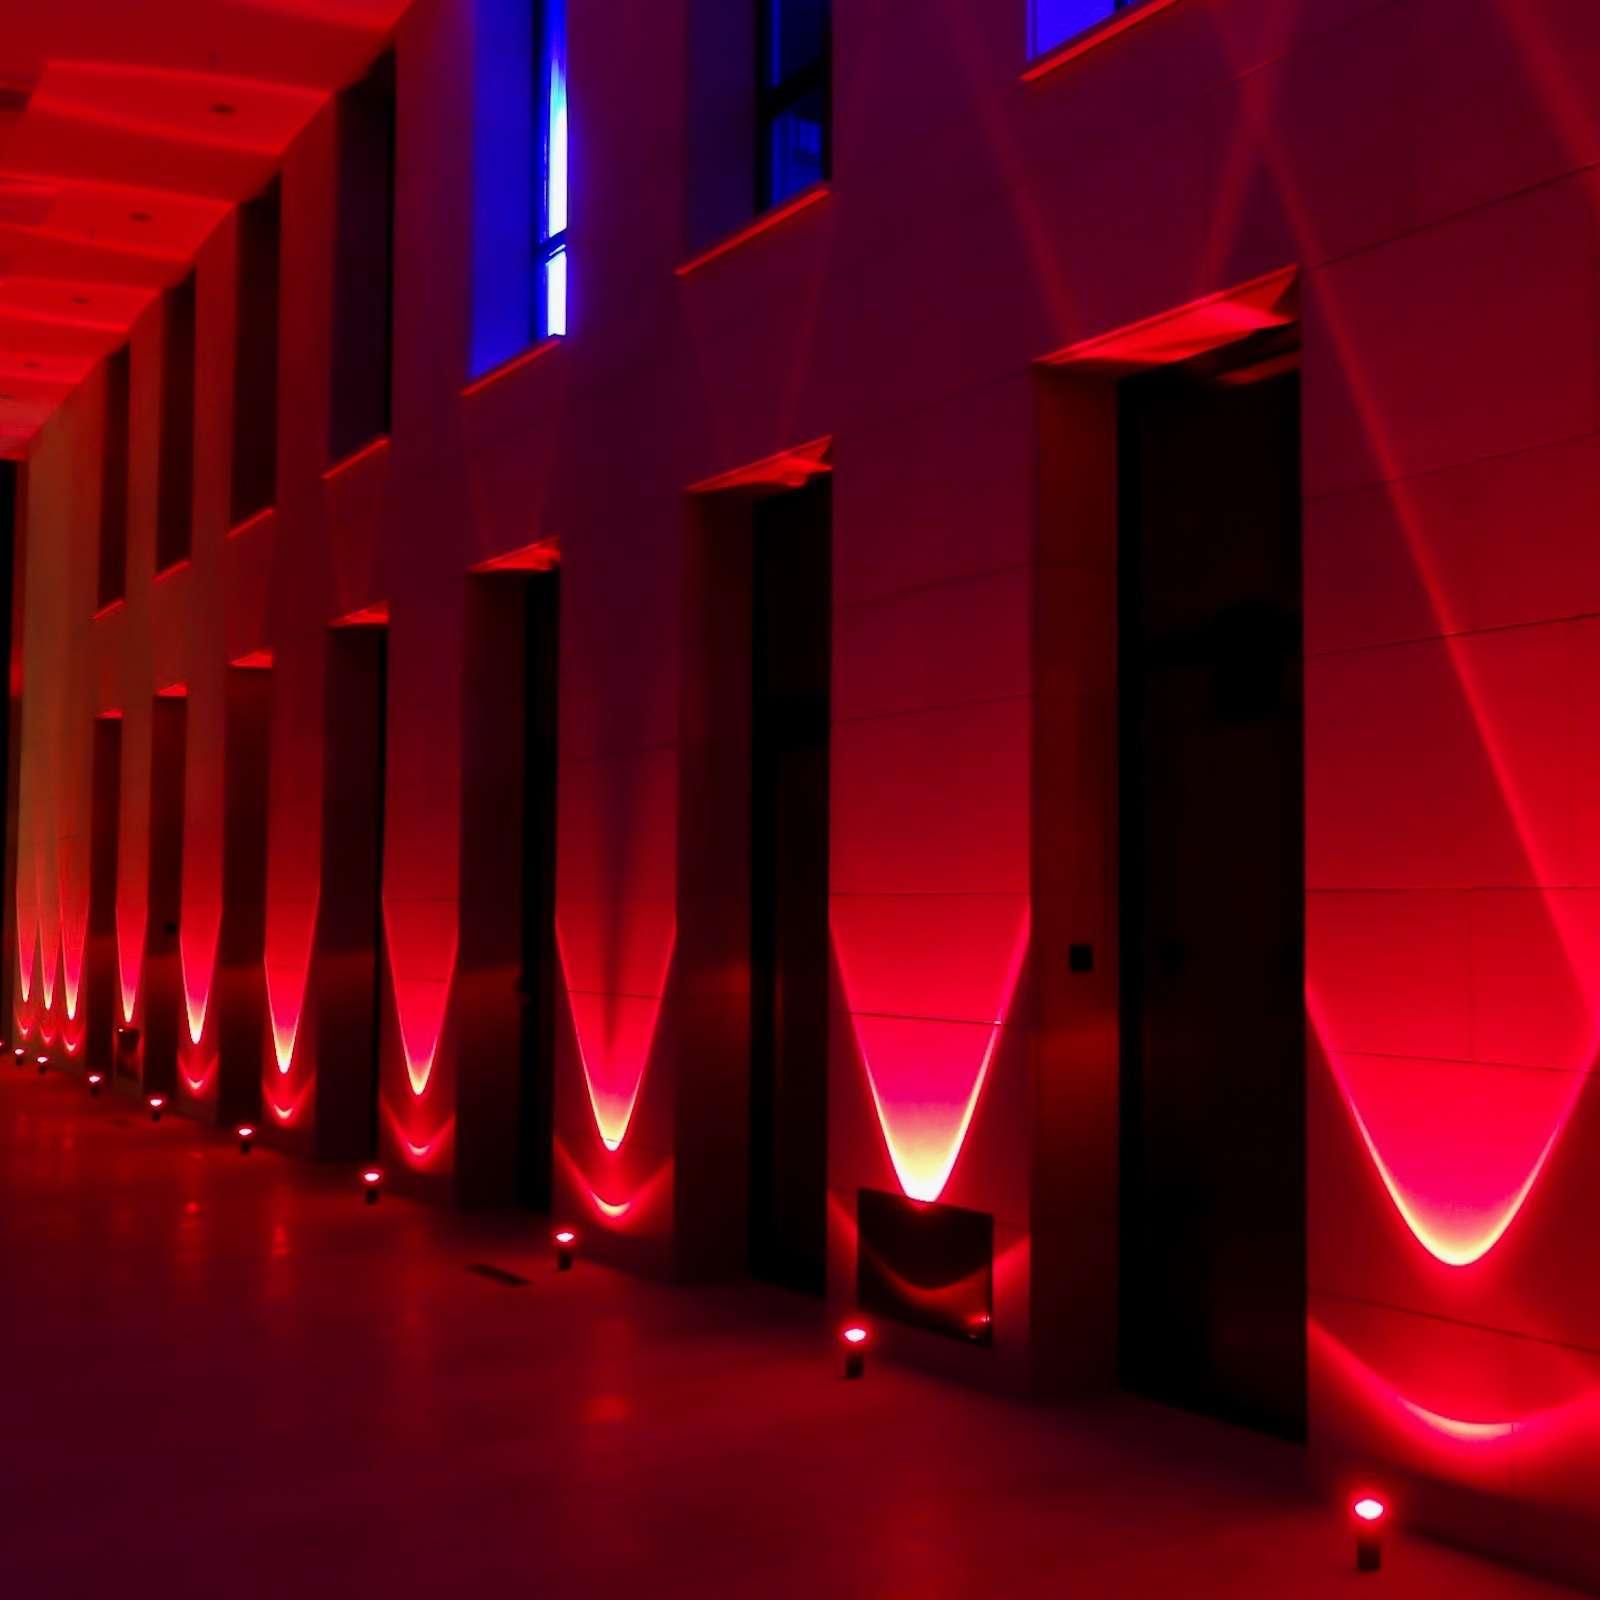 lichttechnik | Indoor | Hannover | Firmenfeier | Ambientebeleuchtung | Gala | Hochzeit | Show | Raumbeleuchtung | Akku | LED | Indoor | Spots | Scheinwerfer | Buchen | Mieten | Lehmann | Eventservice